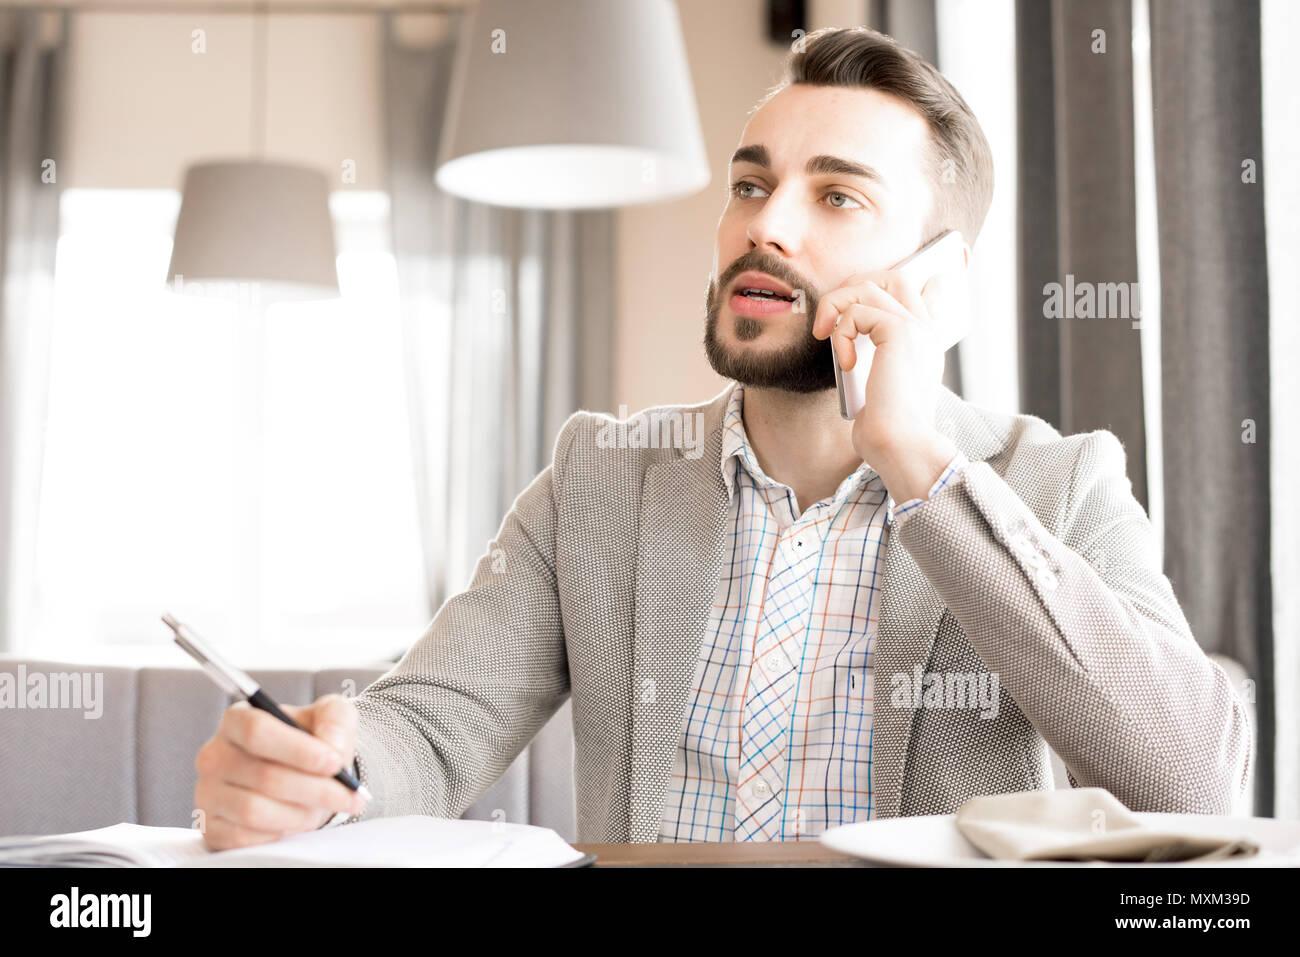 Moderne bärtigen Geschäftsmann im Cafe arbeiten Stockbild